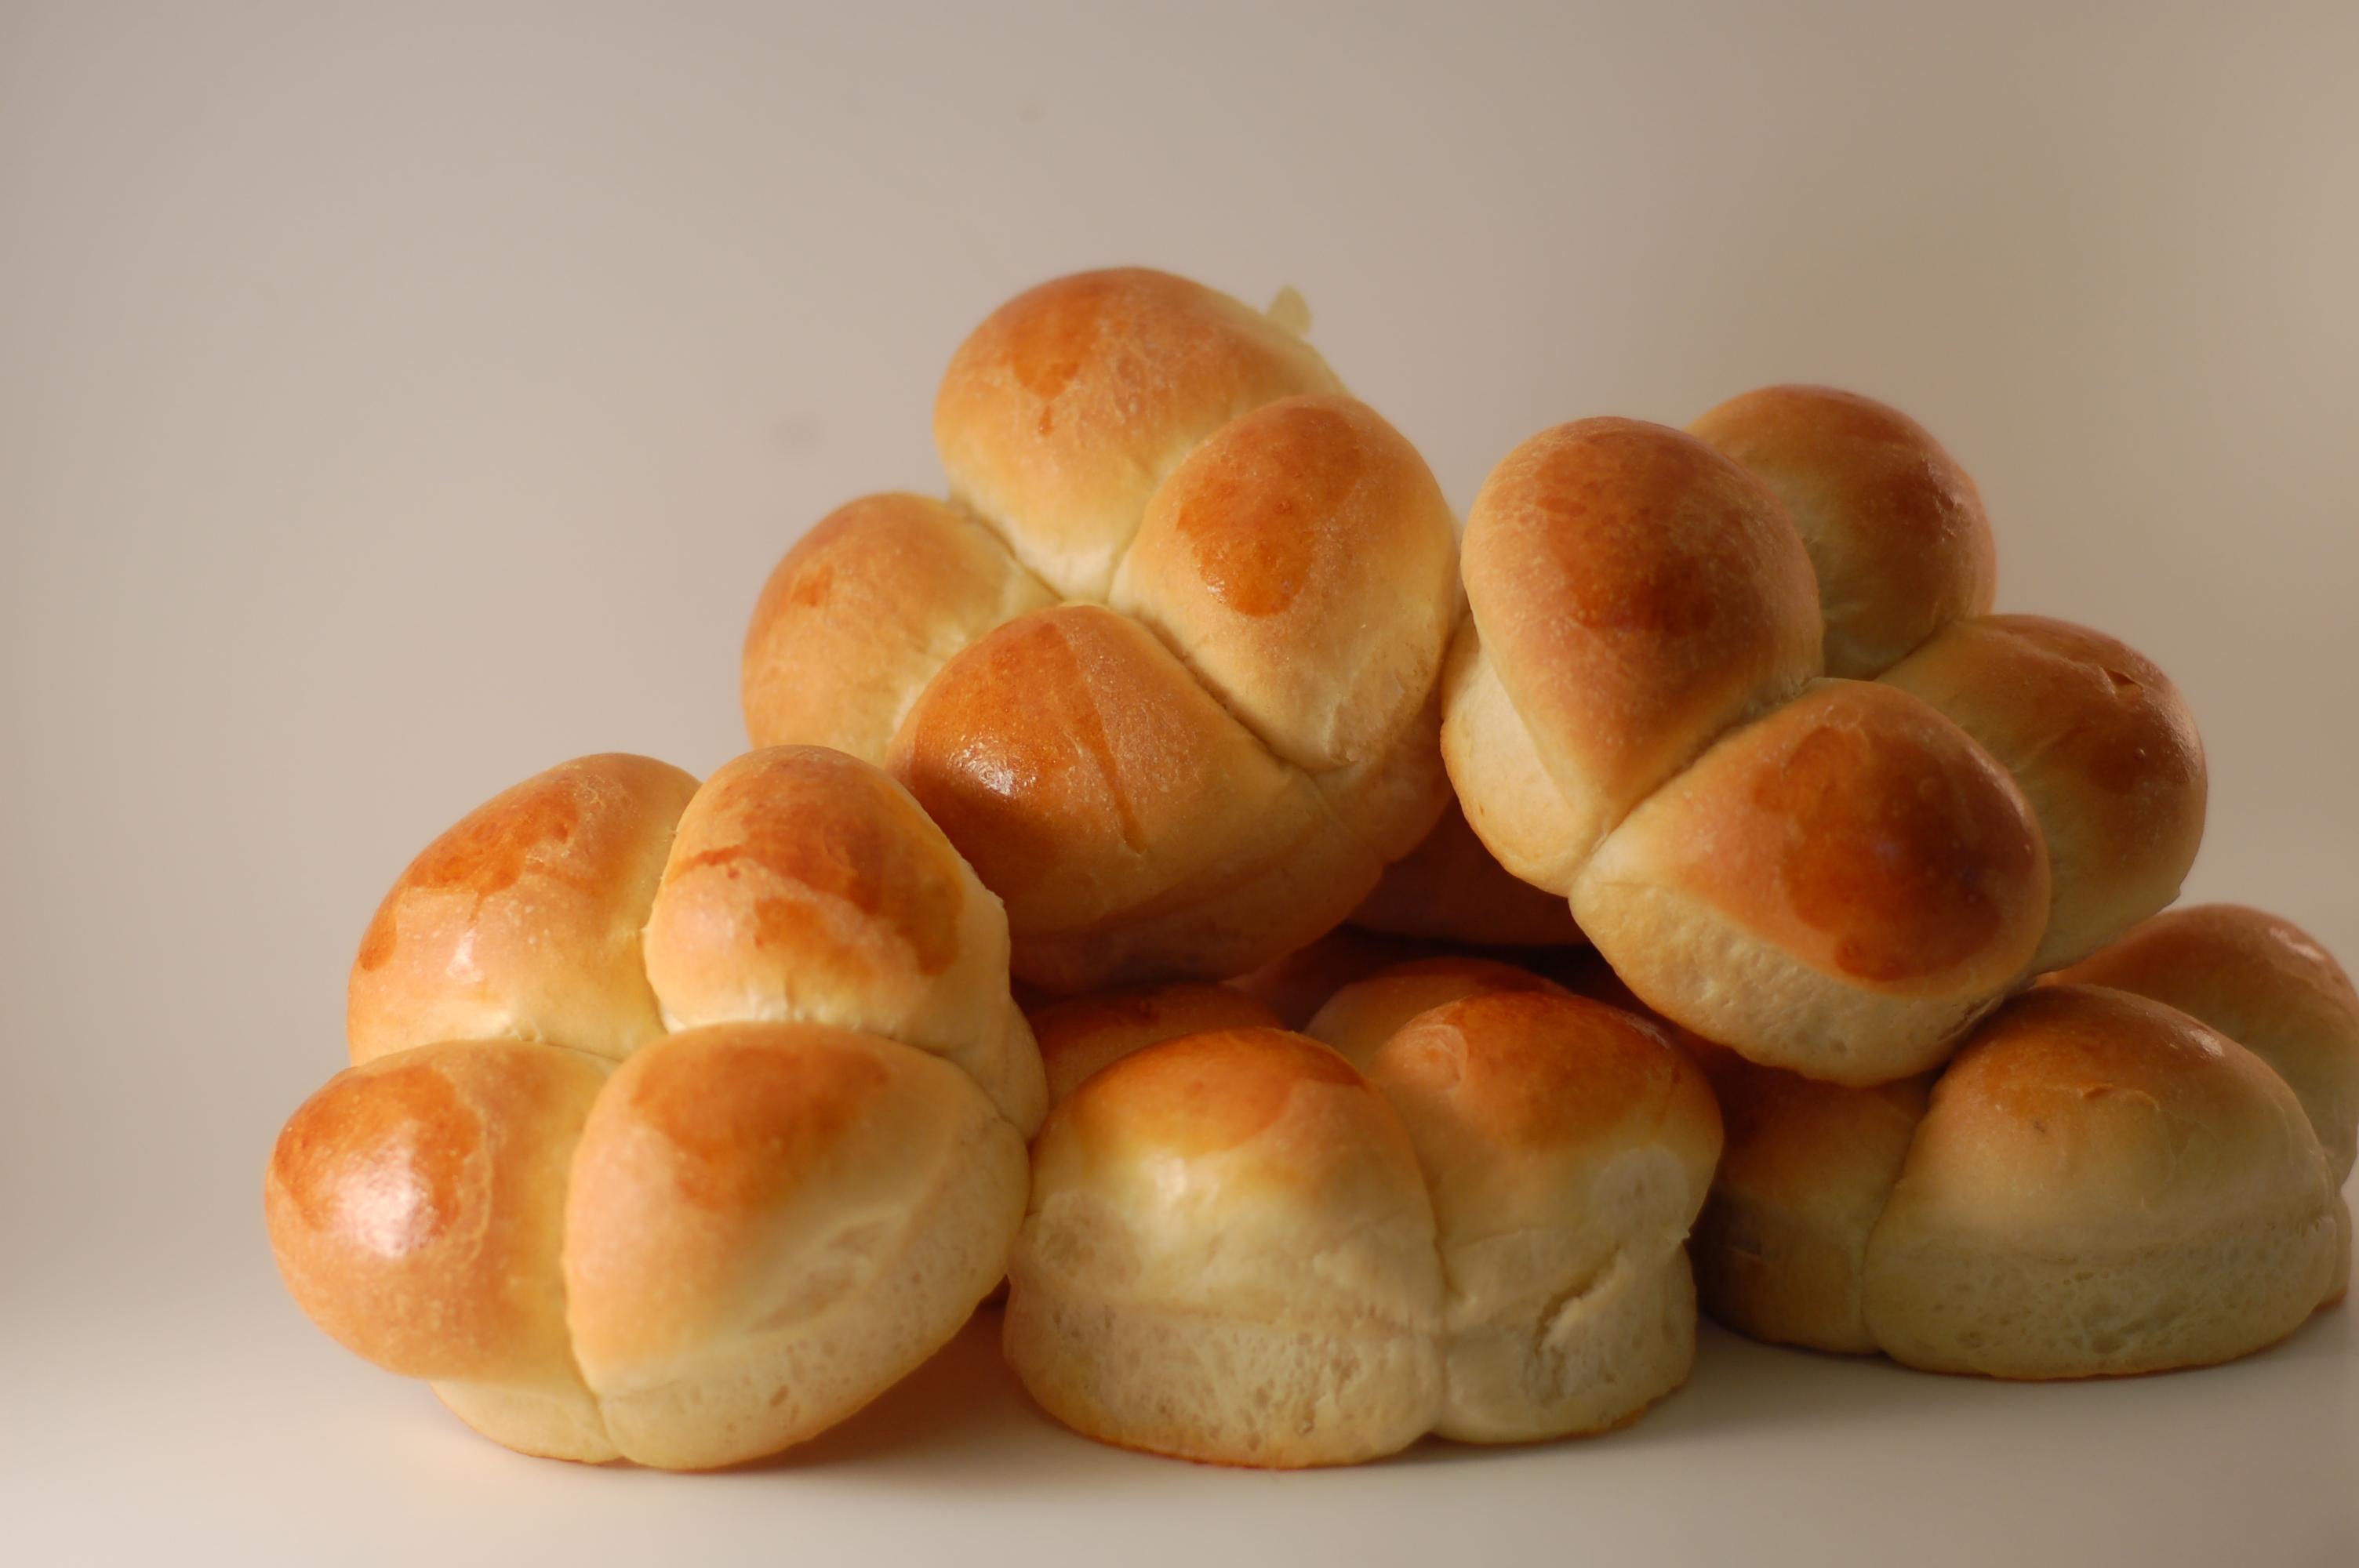 ... rolls pretzel rolls california rolls dinner rolls potato rolls